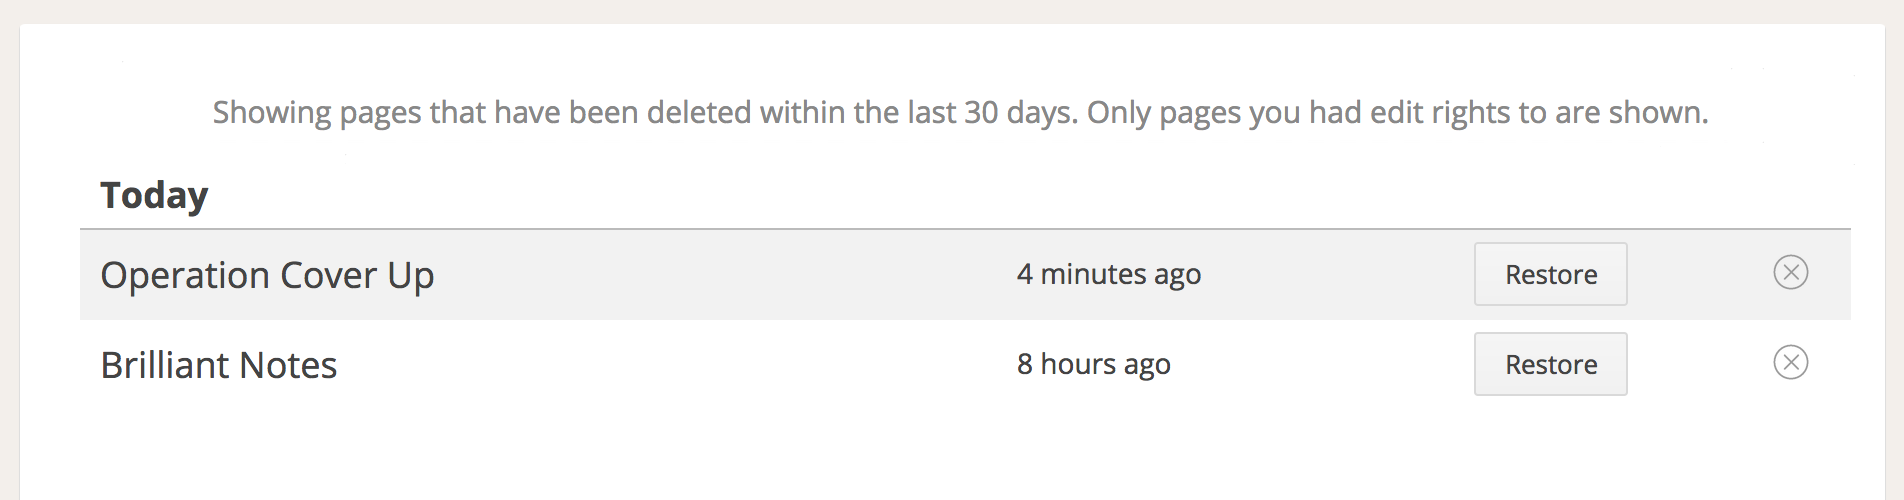 trash-pages-options-screenshot